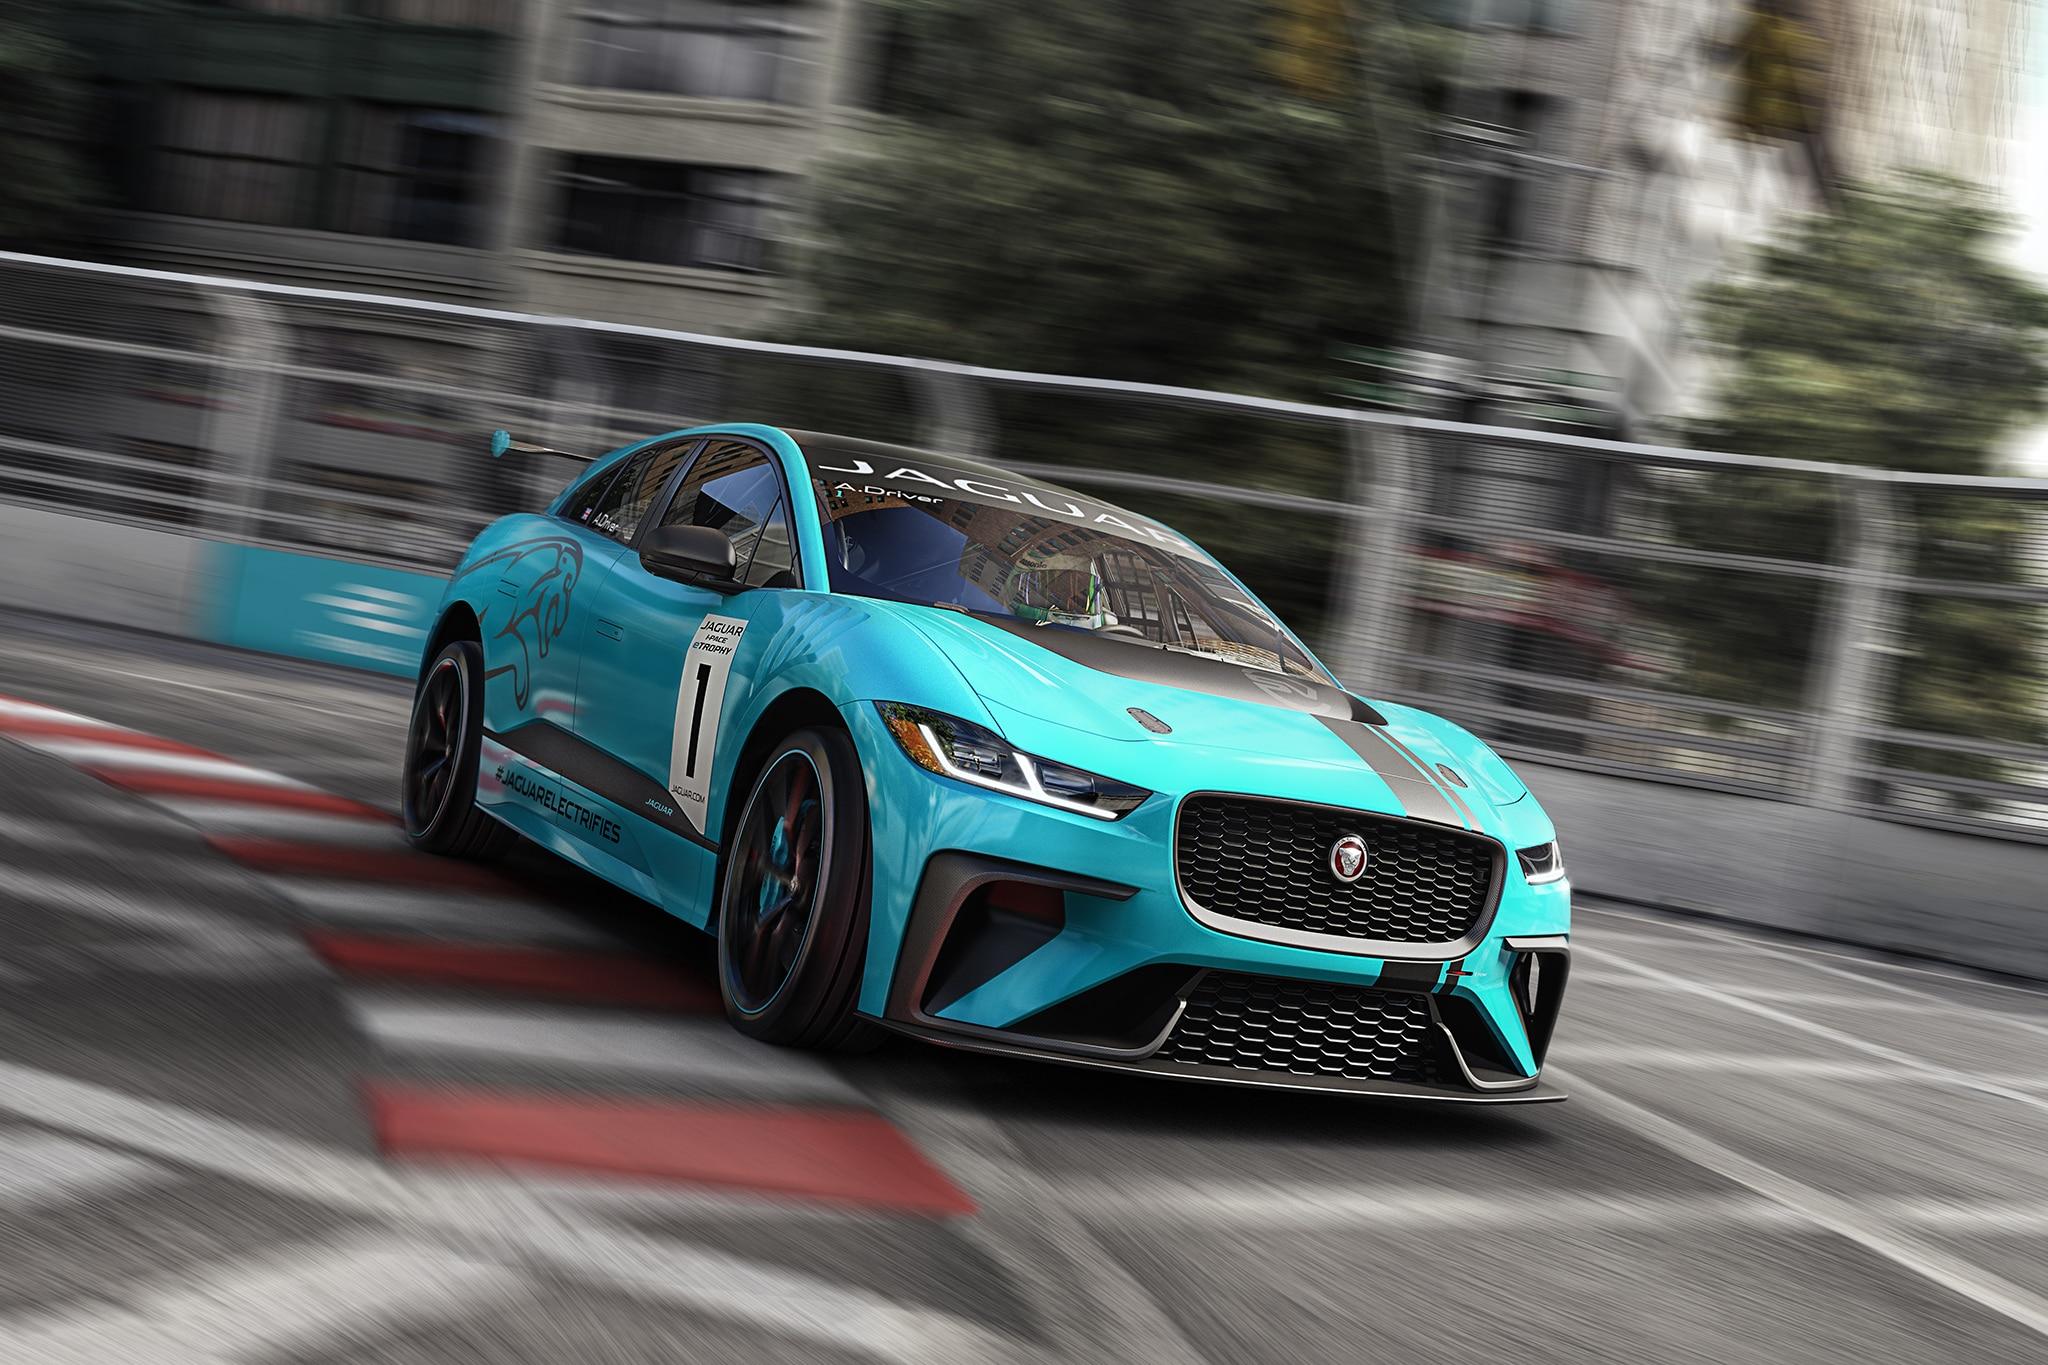 Jaguar I PACE ETROPHY Racecar Track 1 HERO